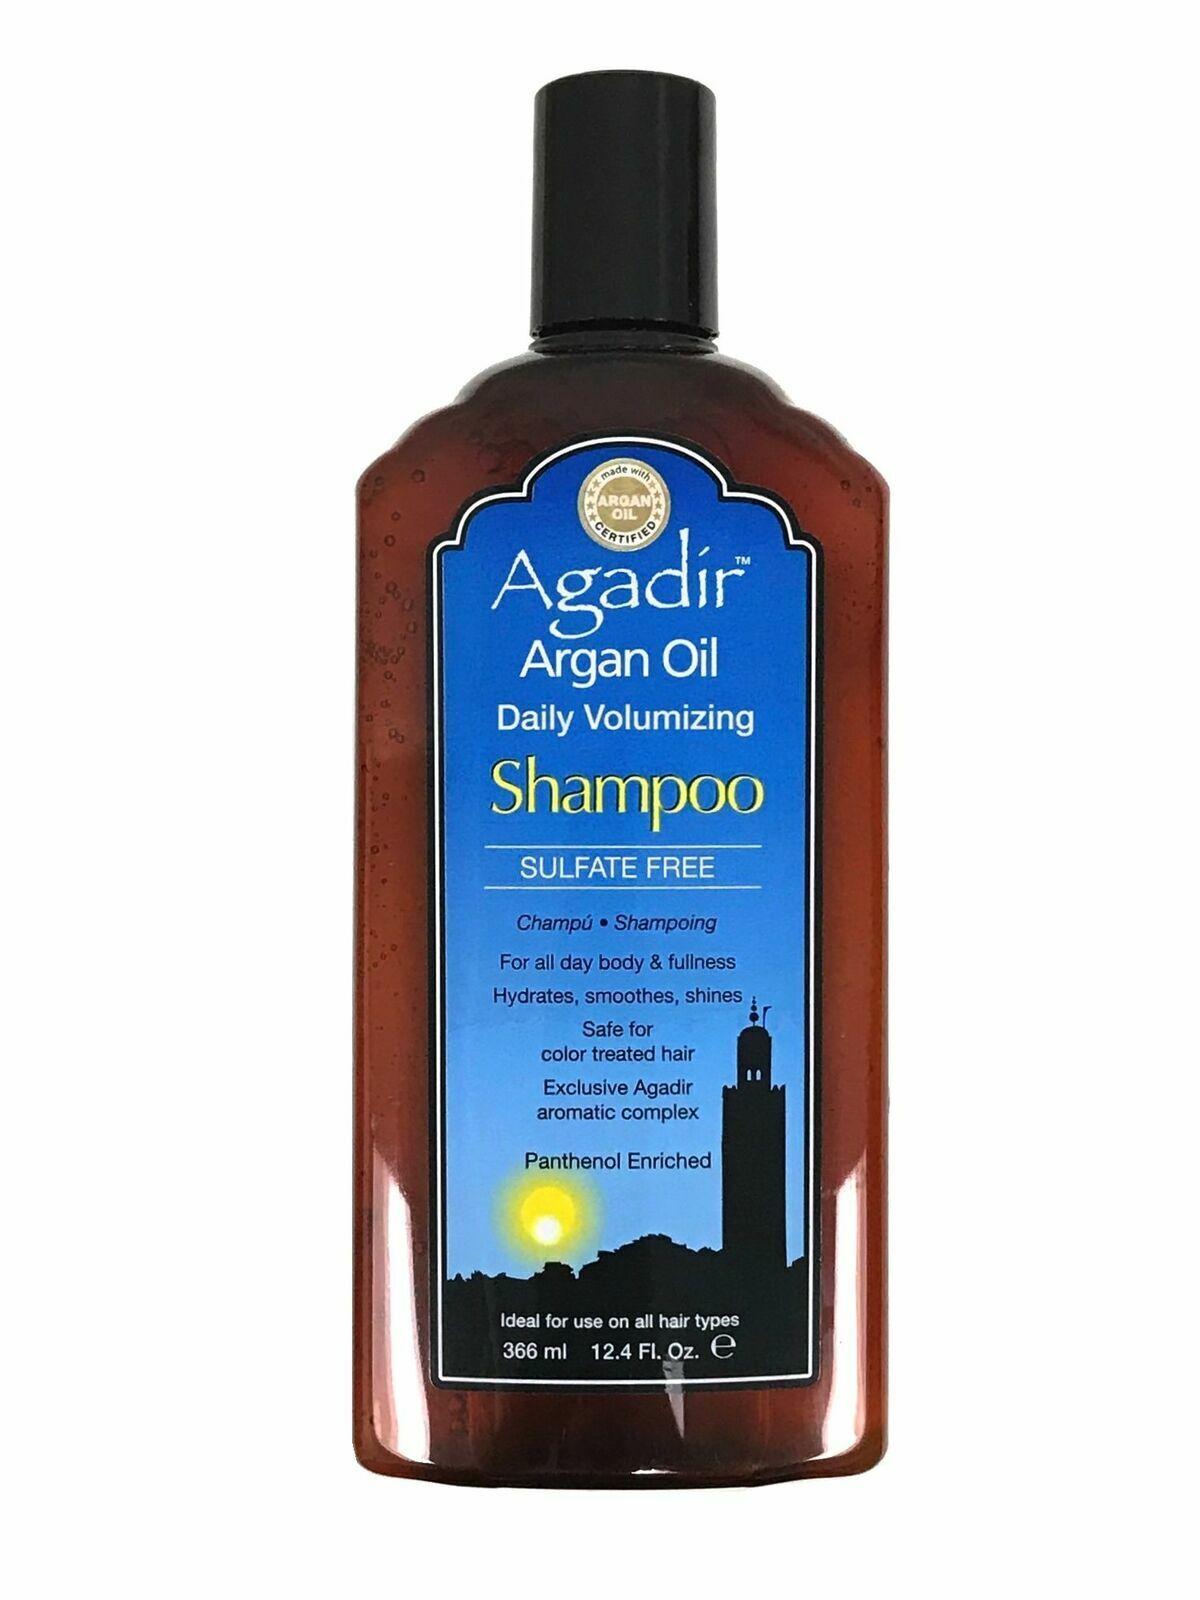 Agadir Argan Oil Daily Volumizing Shampoo for Unisex - 12.4